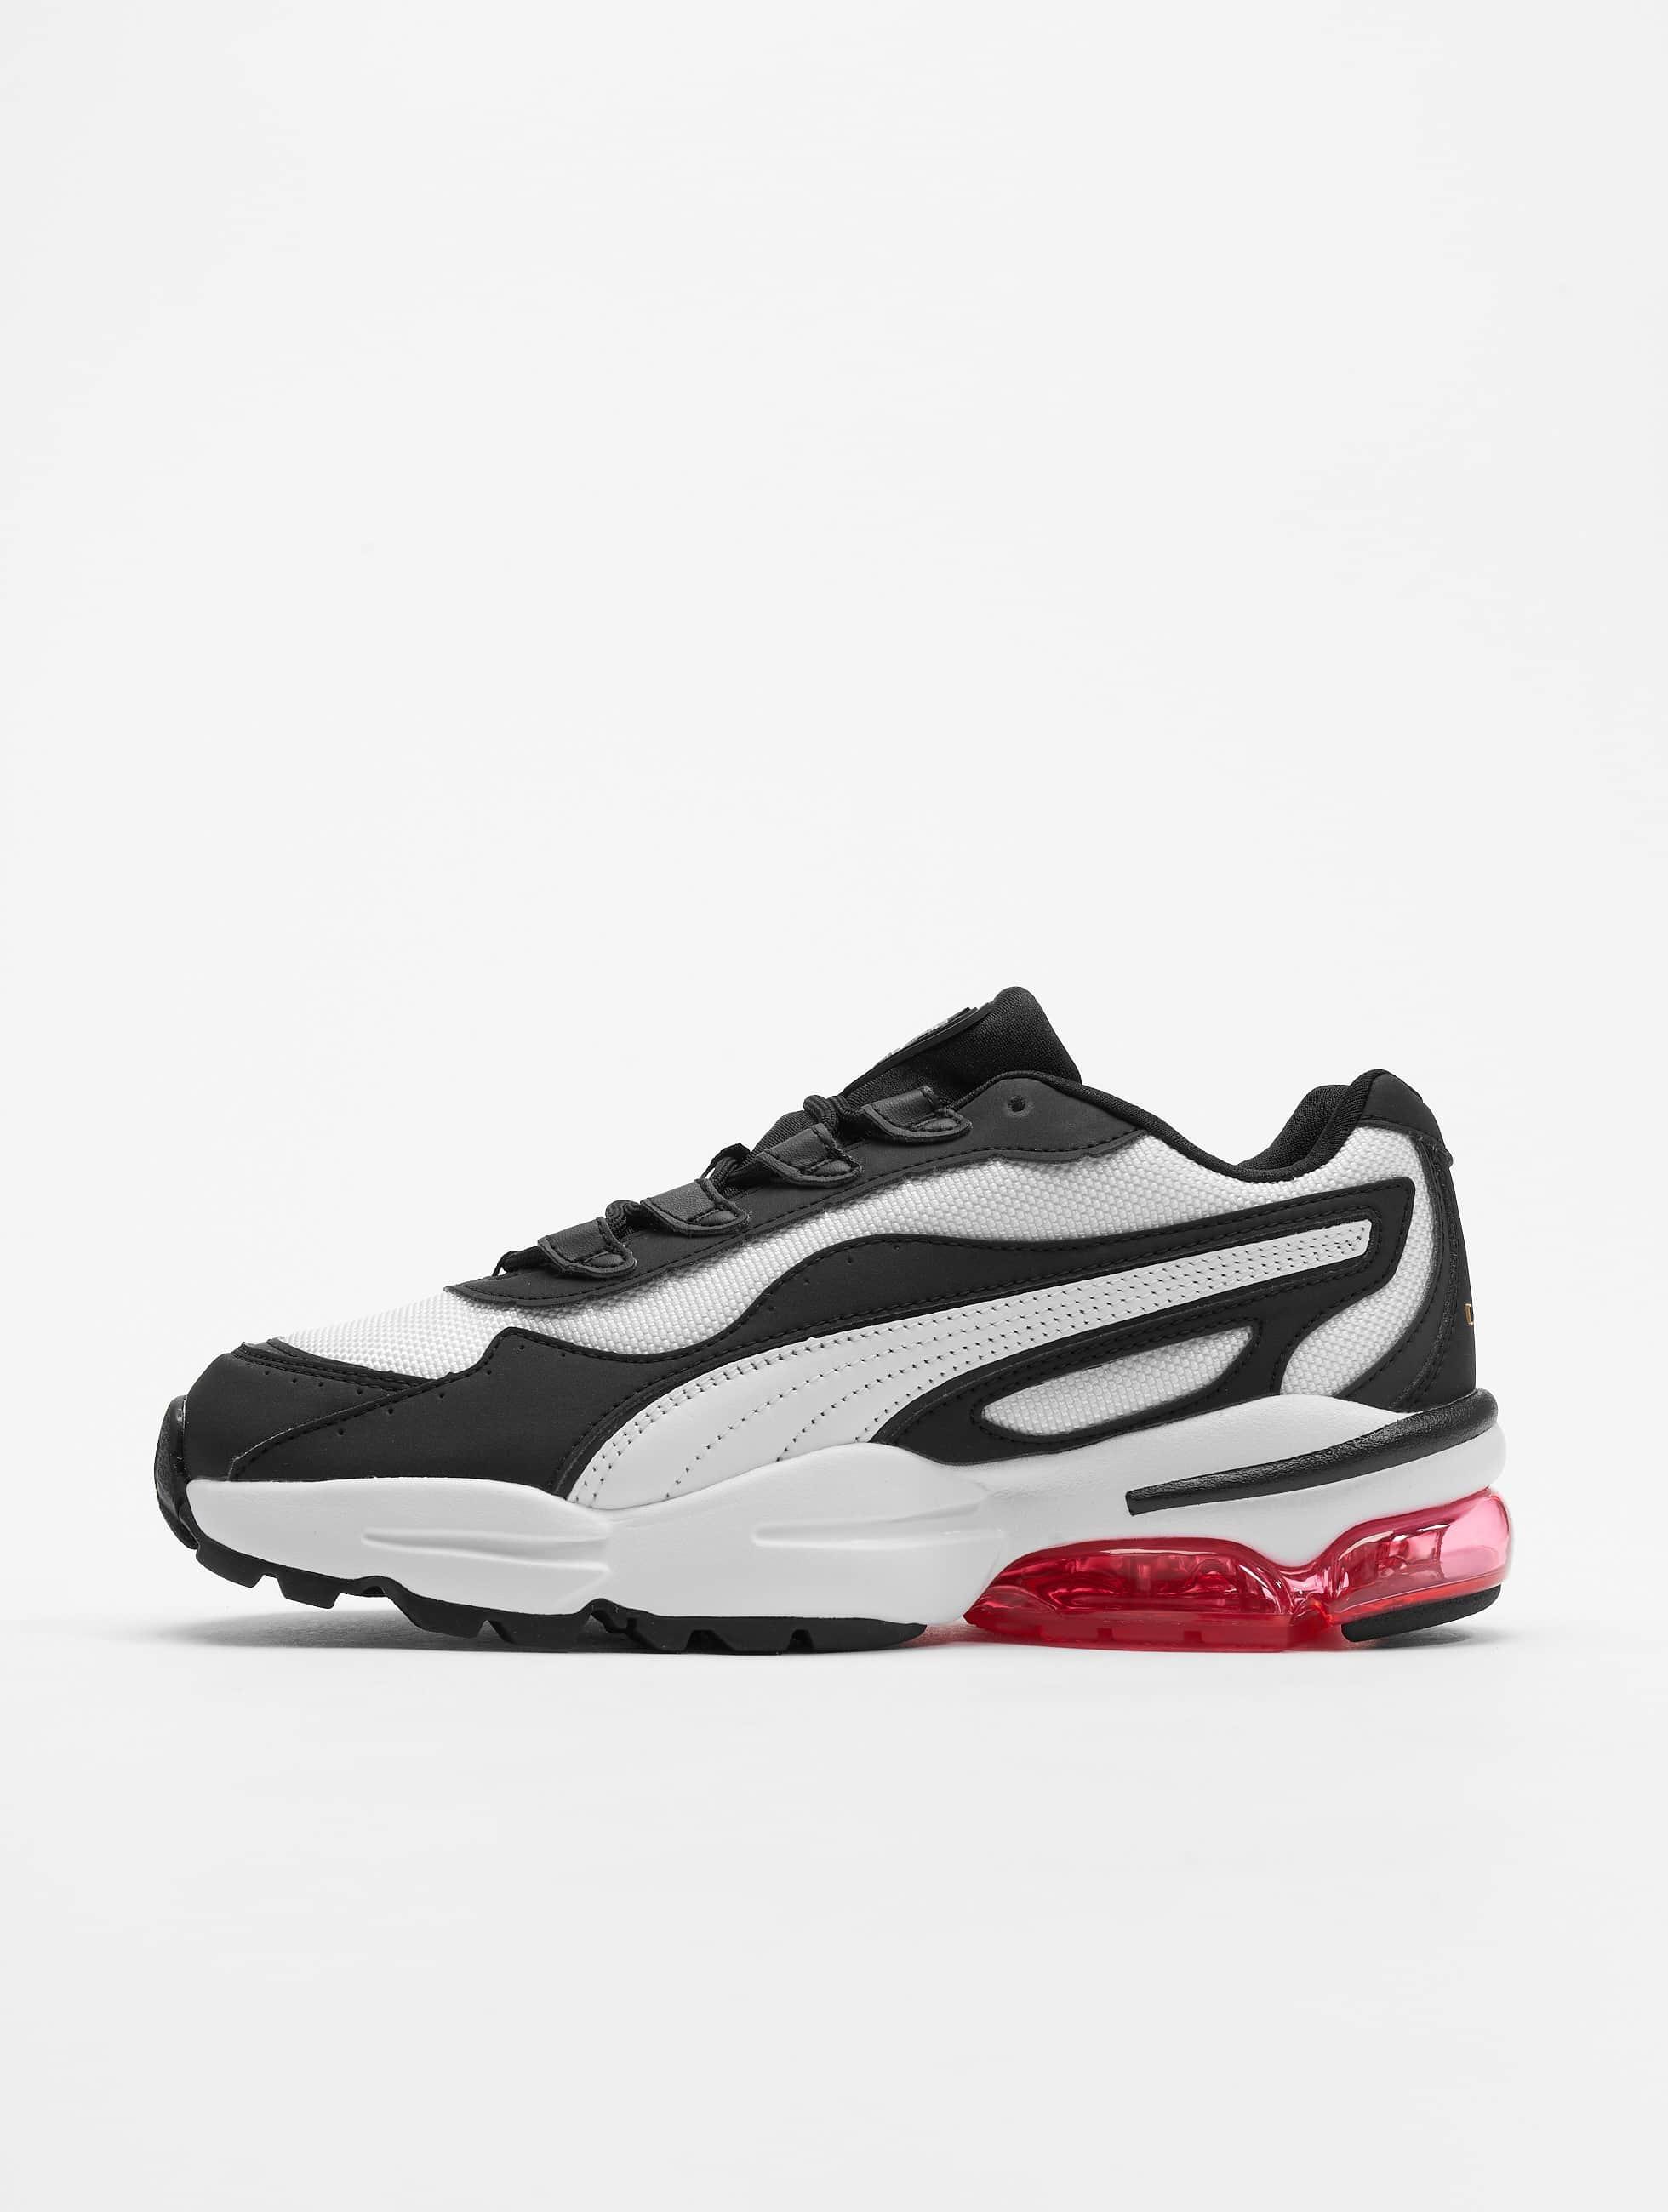 Puma Cell Stellar Sneakers Puma White/Puma Black